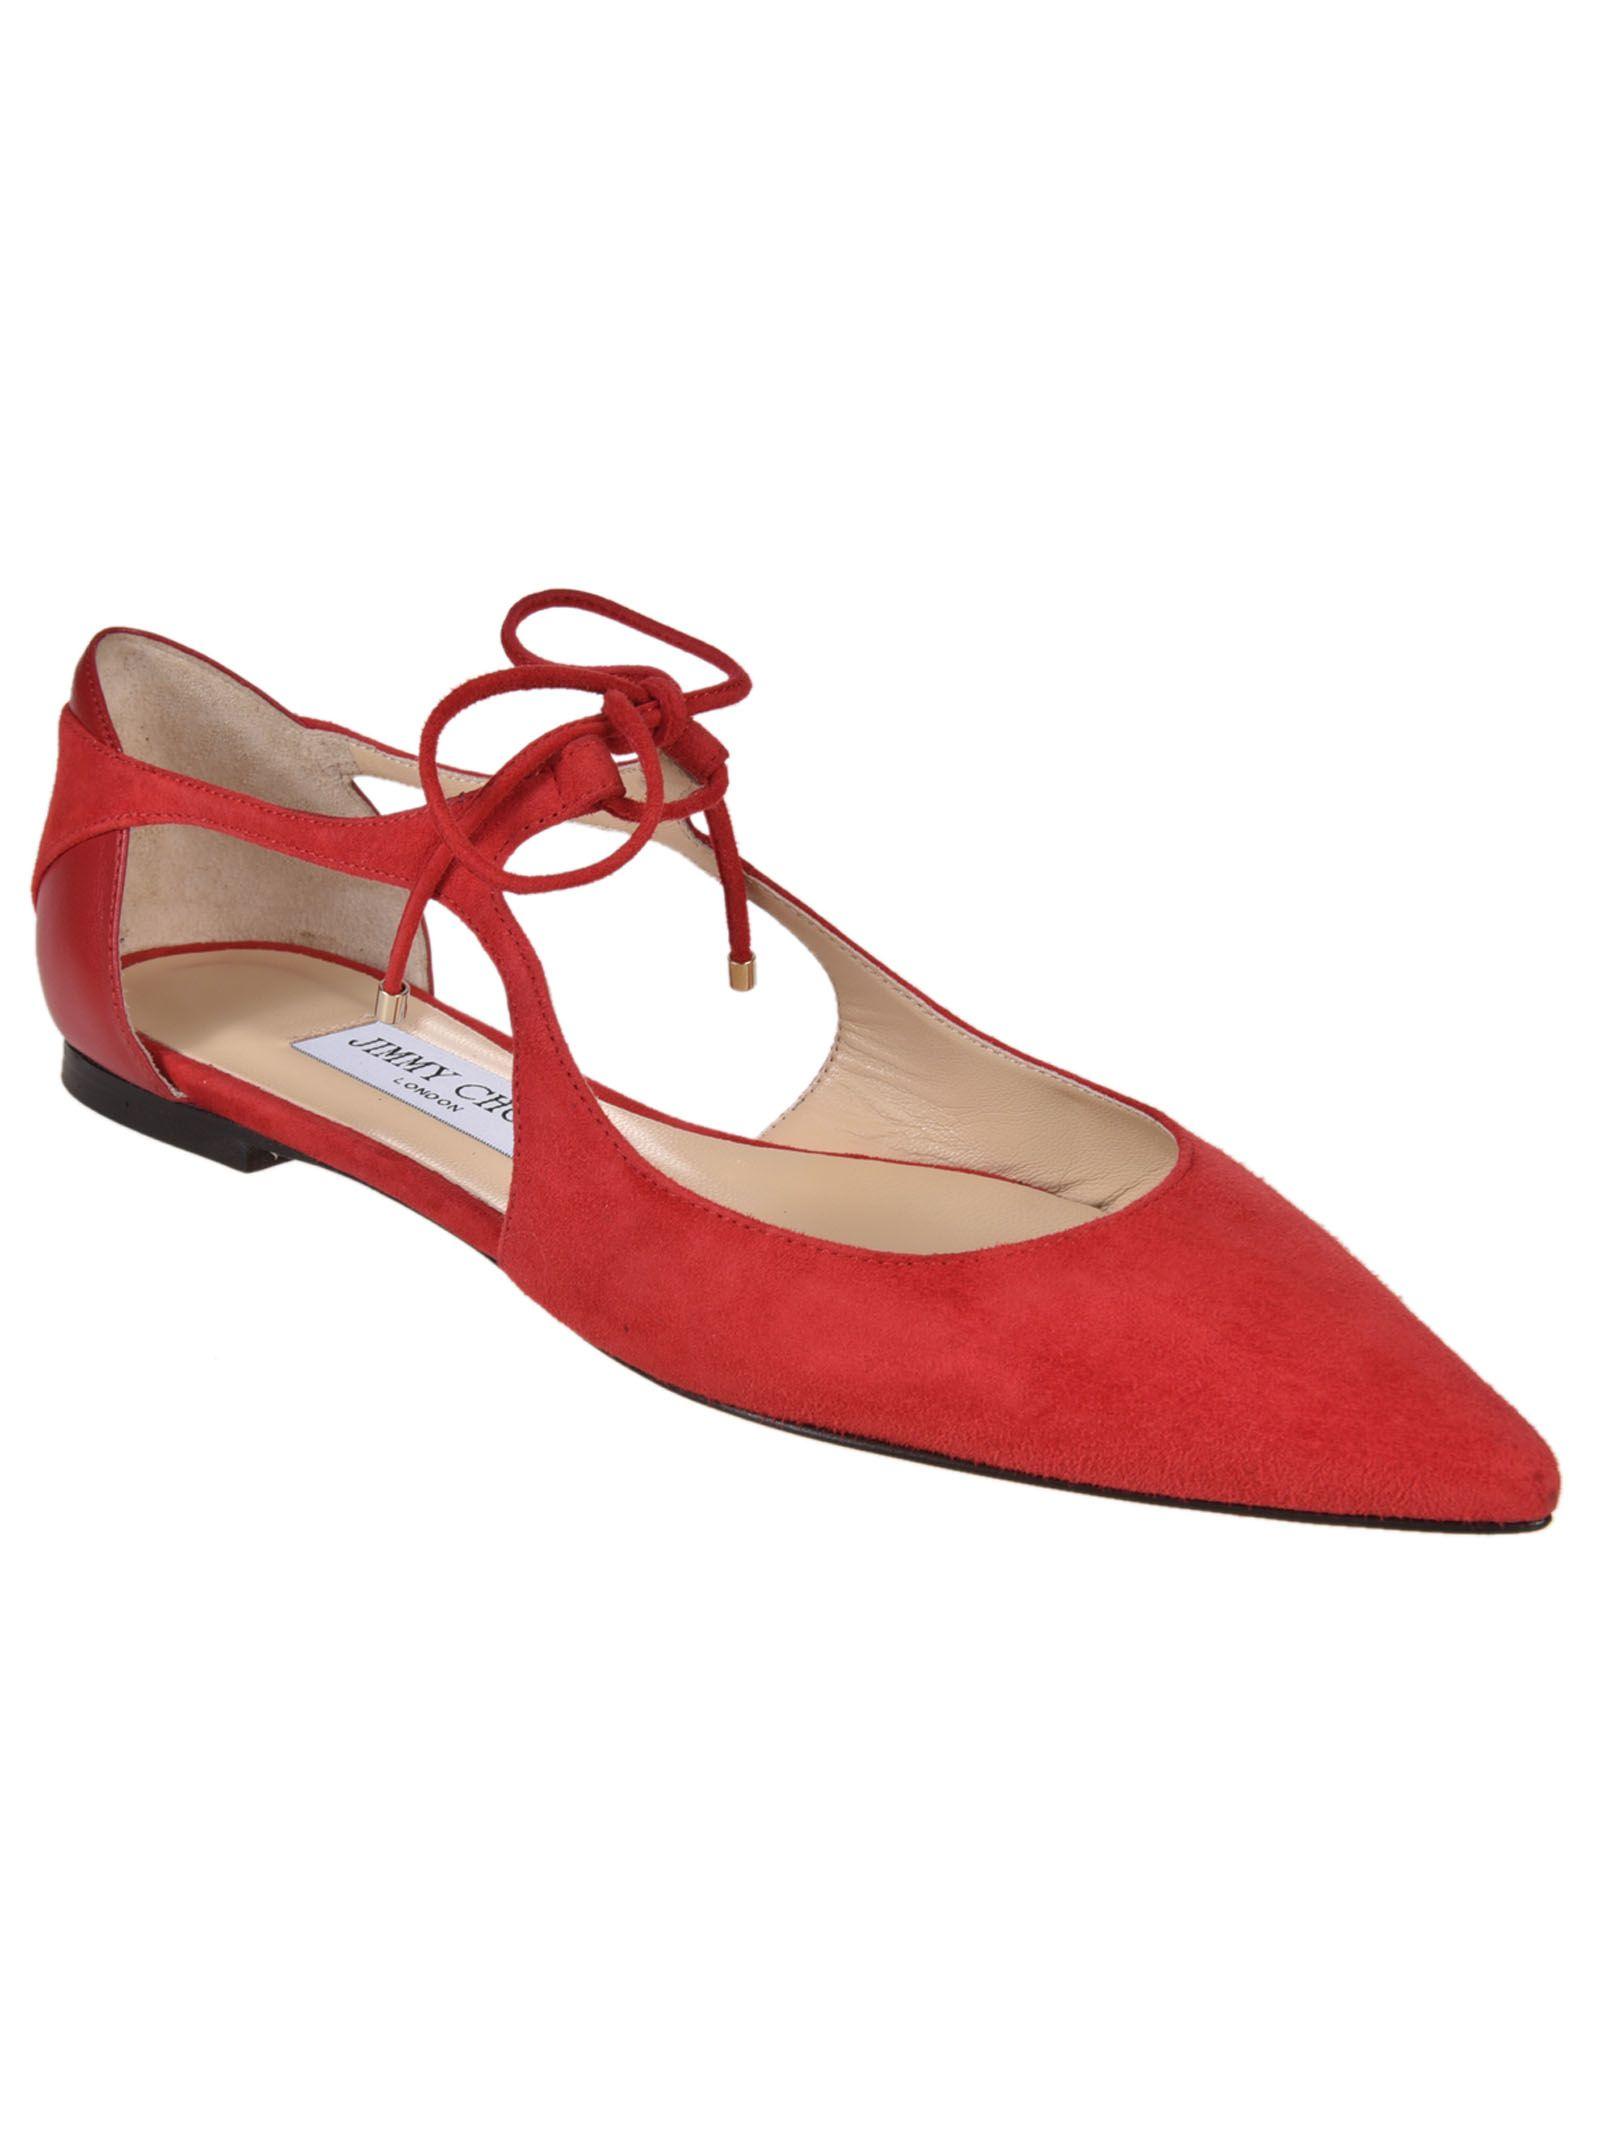 jimmy choo jimmy choo vanessa ballerinas rosso women 39 s shoes italist. Black Bedroom Furniture Sets. Home Design Ideas